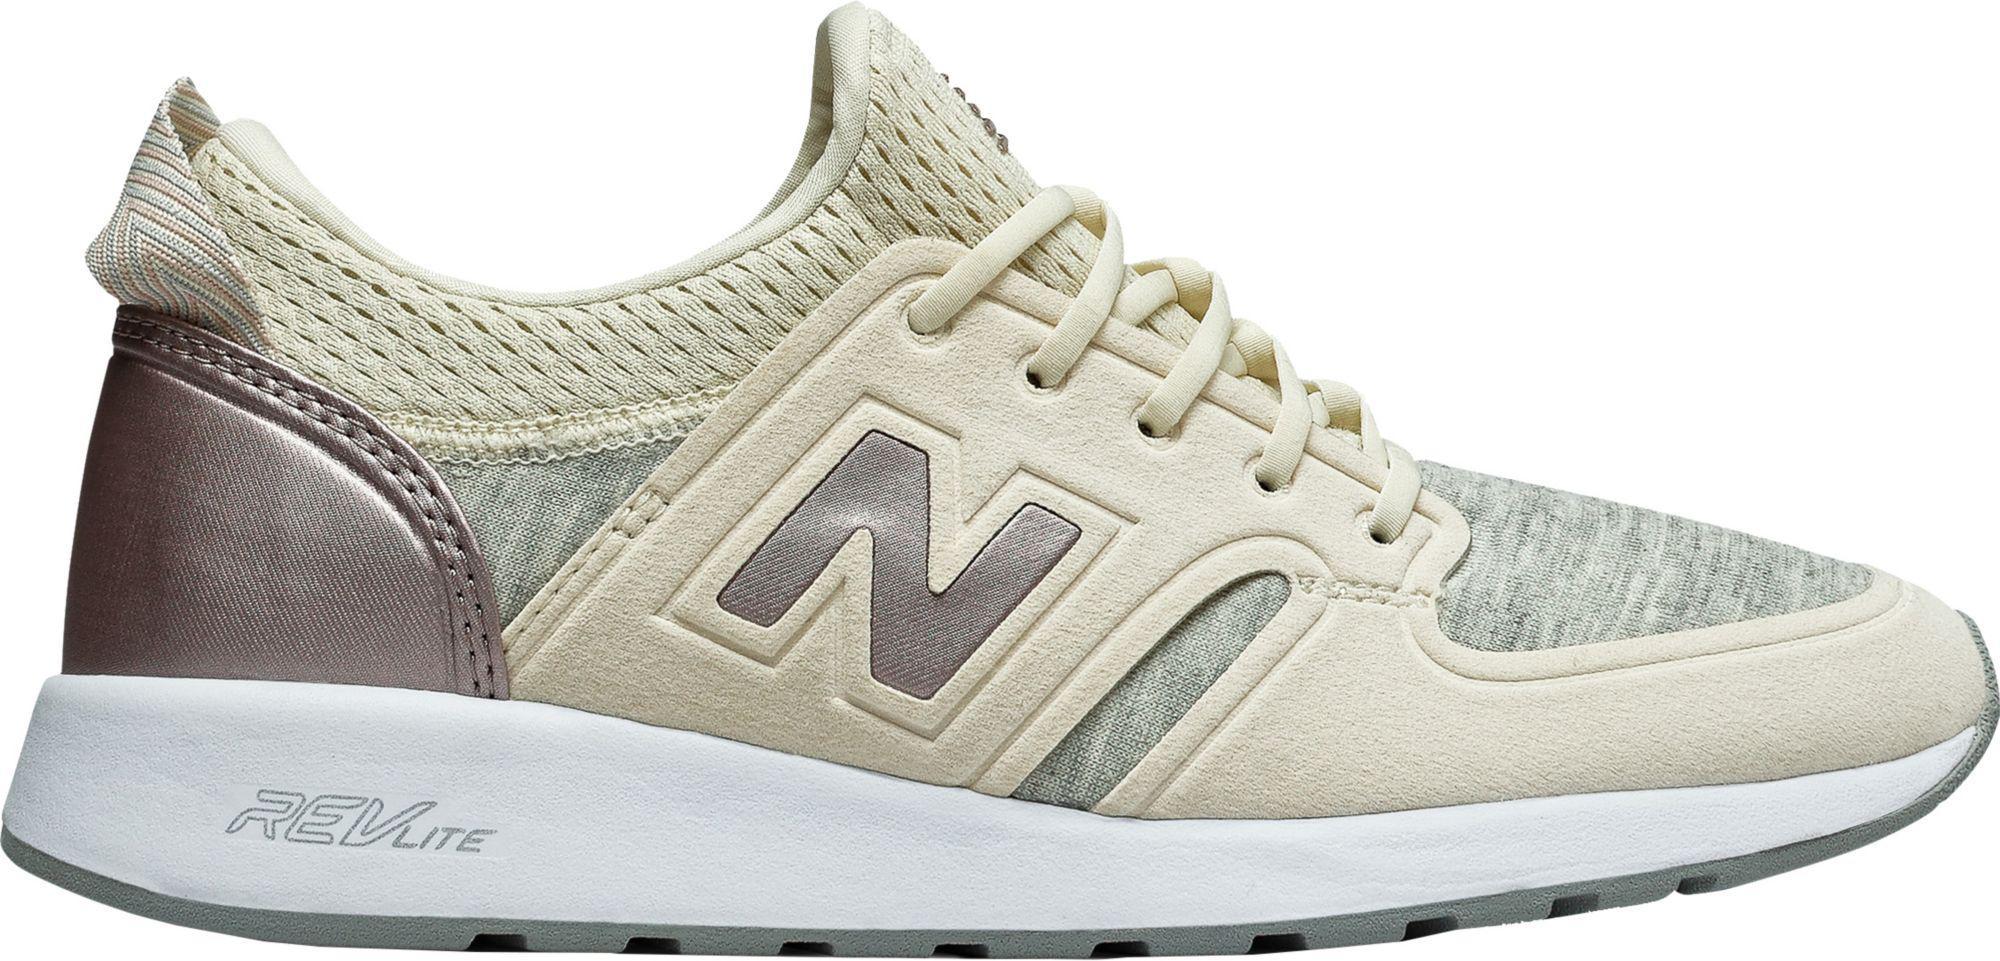 new balance beige 420 revlite trainers